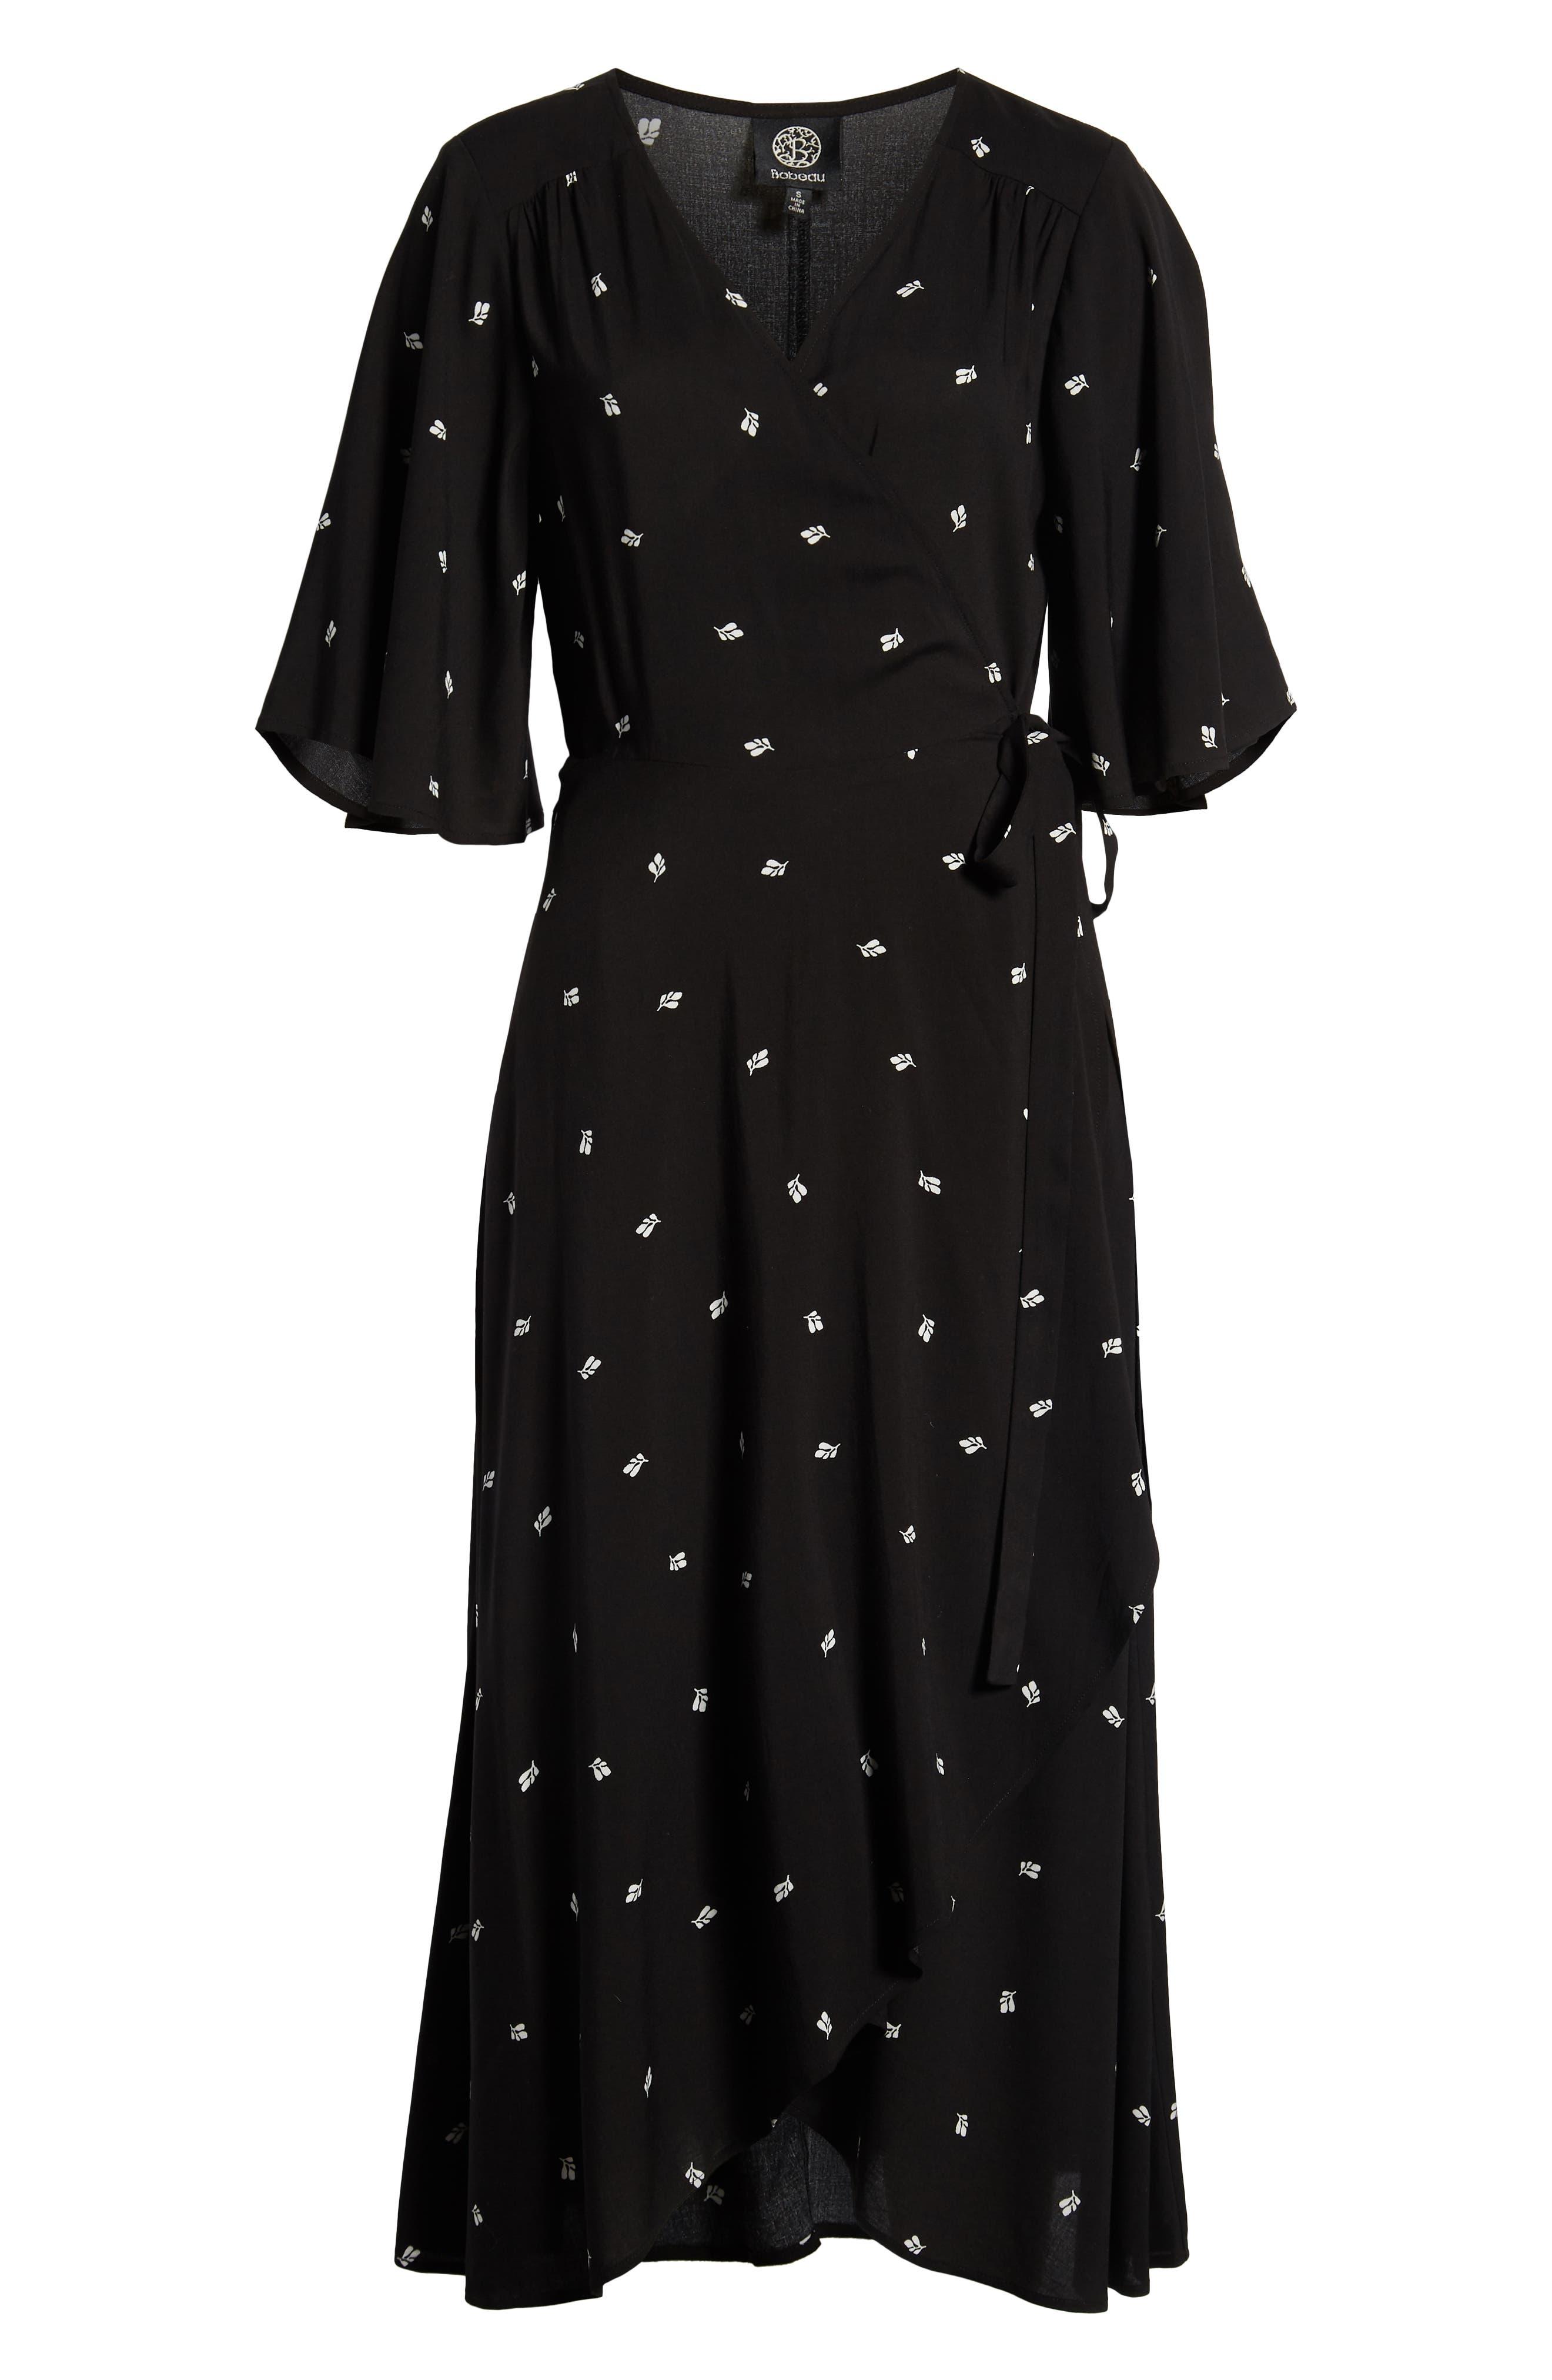 BOBEAU, Orna High/Low Wrap Dress, Alternate thumbnail 7, color, BLACK LEAF PRINT